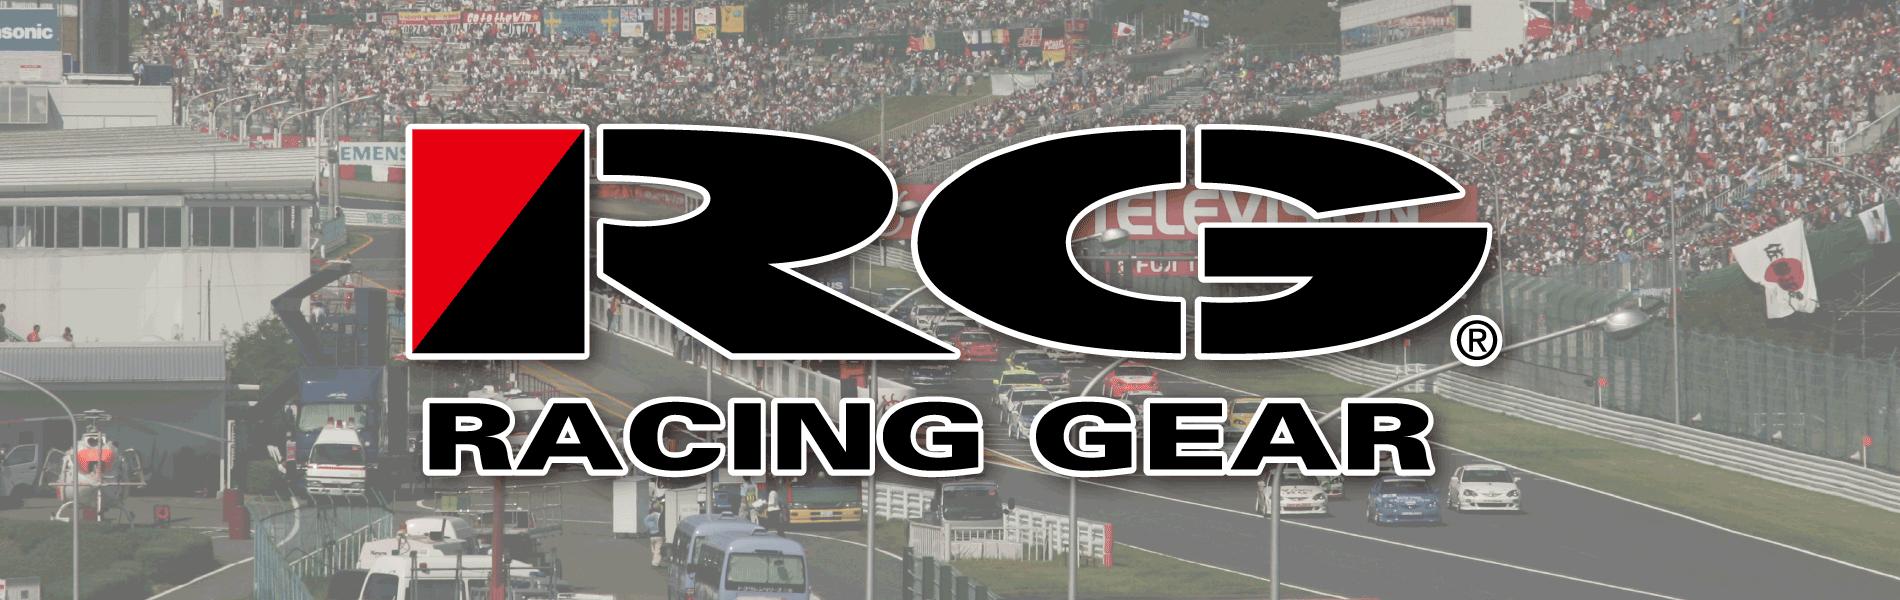 RG RACING GEAR レーシングギア